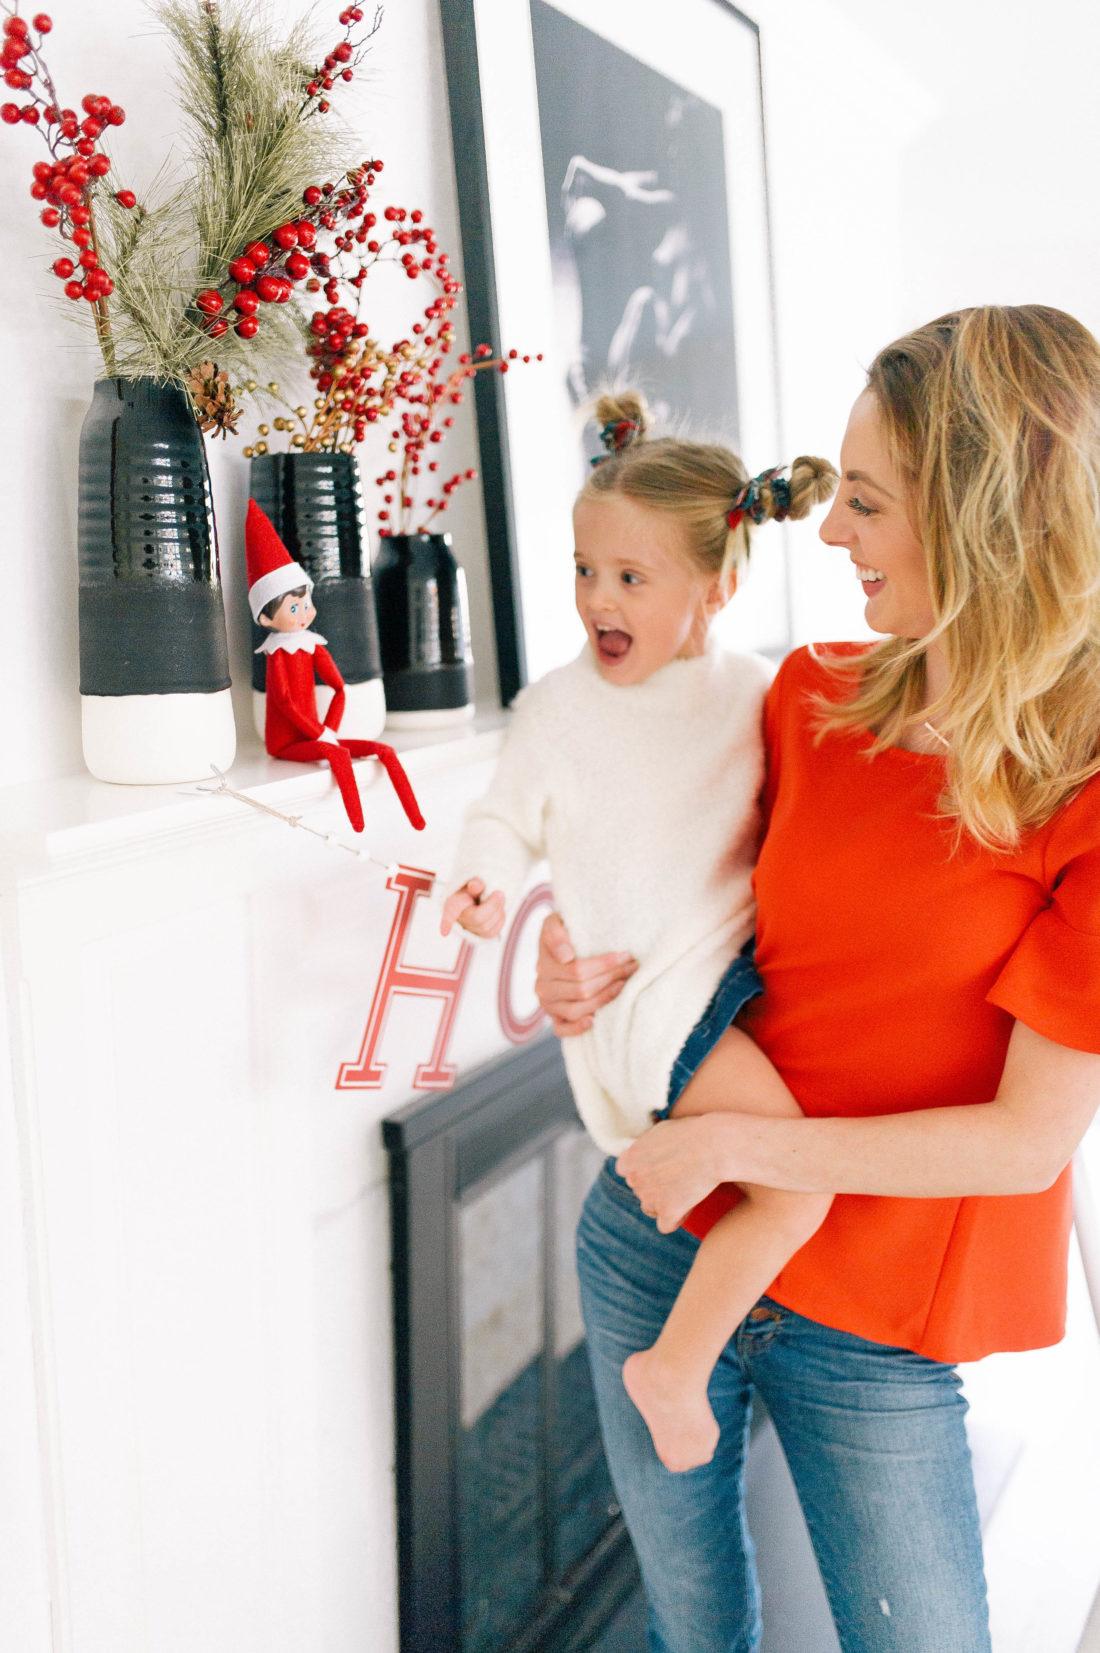 Eva Amurri Martino introduces the Elf On The Shelf tradition to her kids